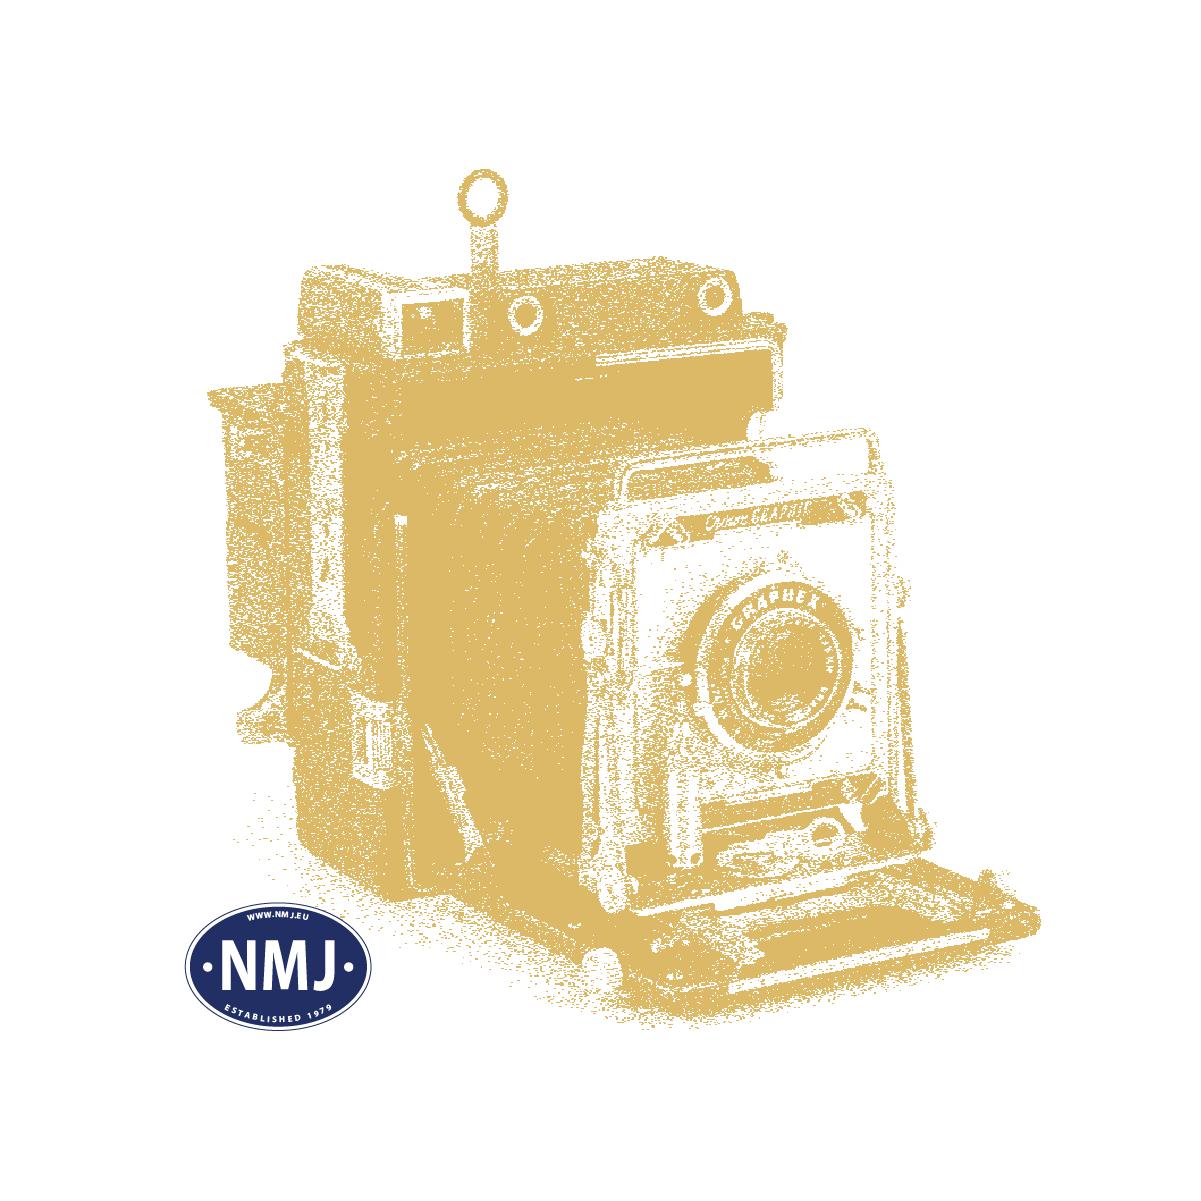 MIG0105 - Washable Dust (RAL 8000), Washable Paint, Akrylmaling (17 ml)